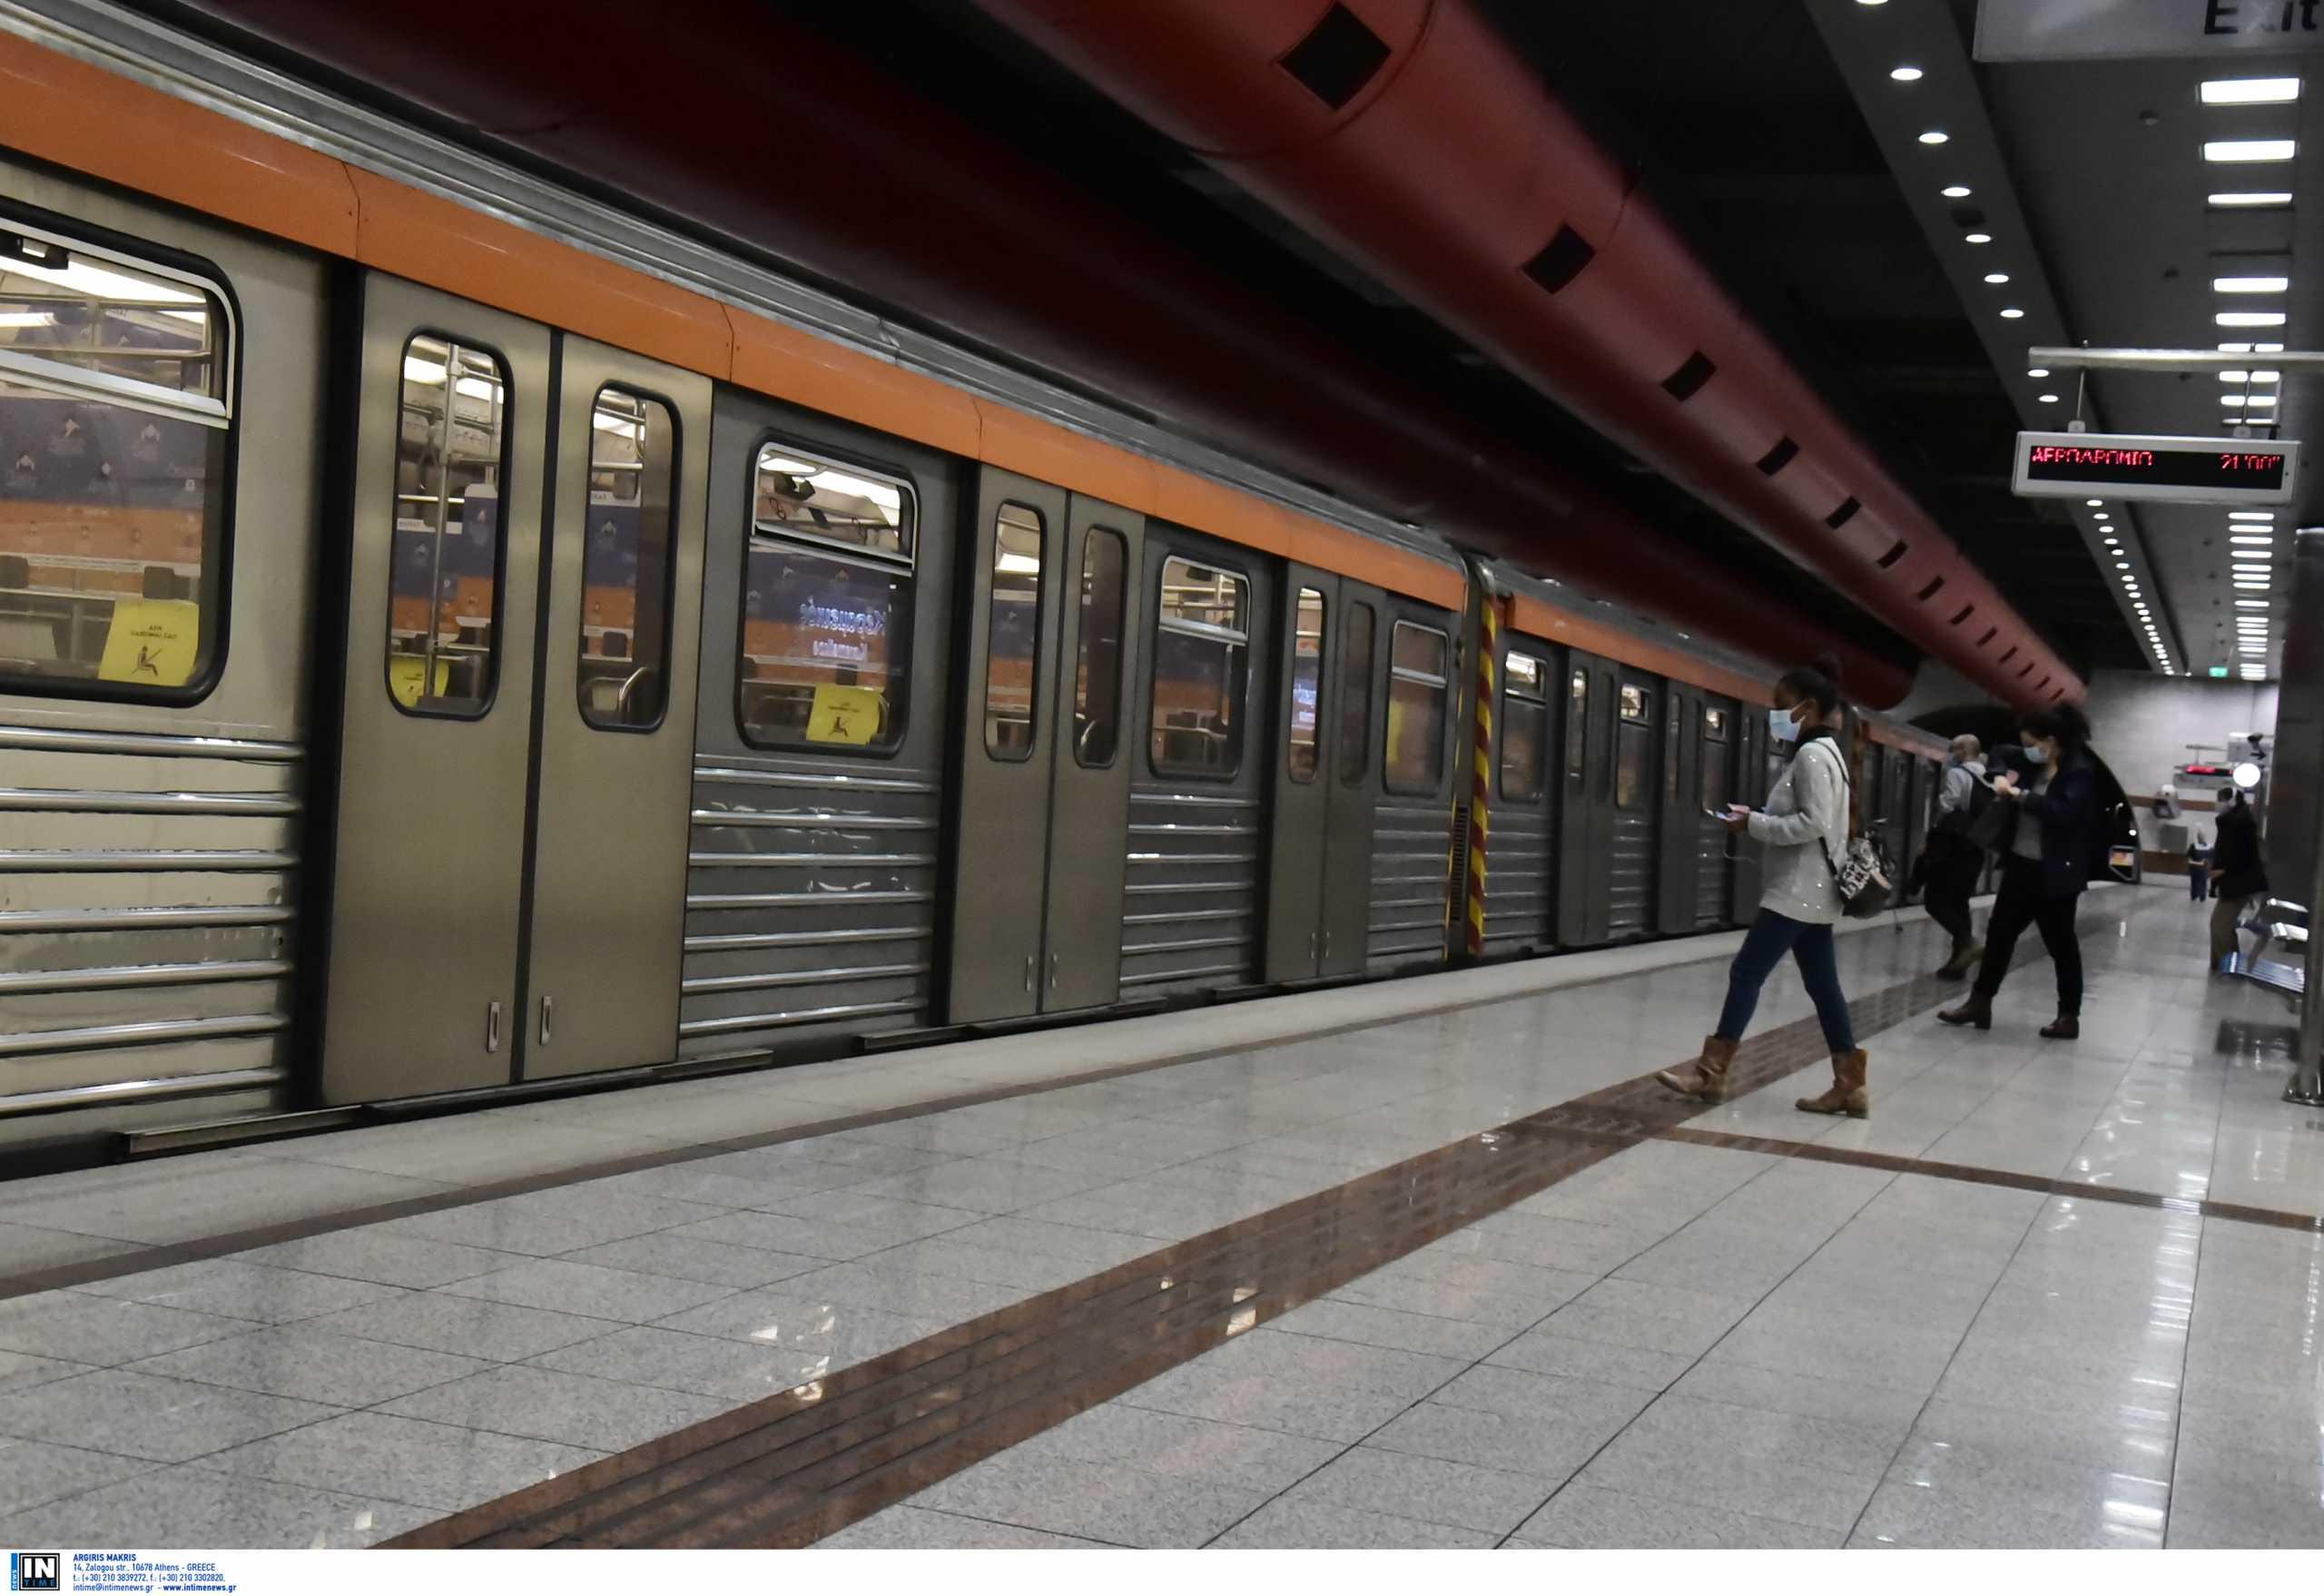 Eumed9: Κλειστοί οι σταθμοί του Μετρό Σύνταγμα και Πανεπιστήμιο